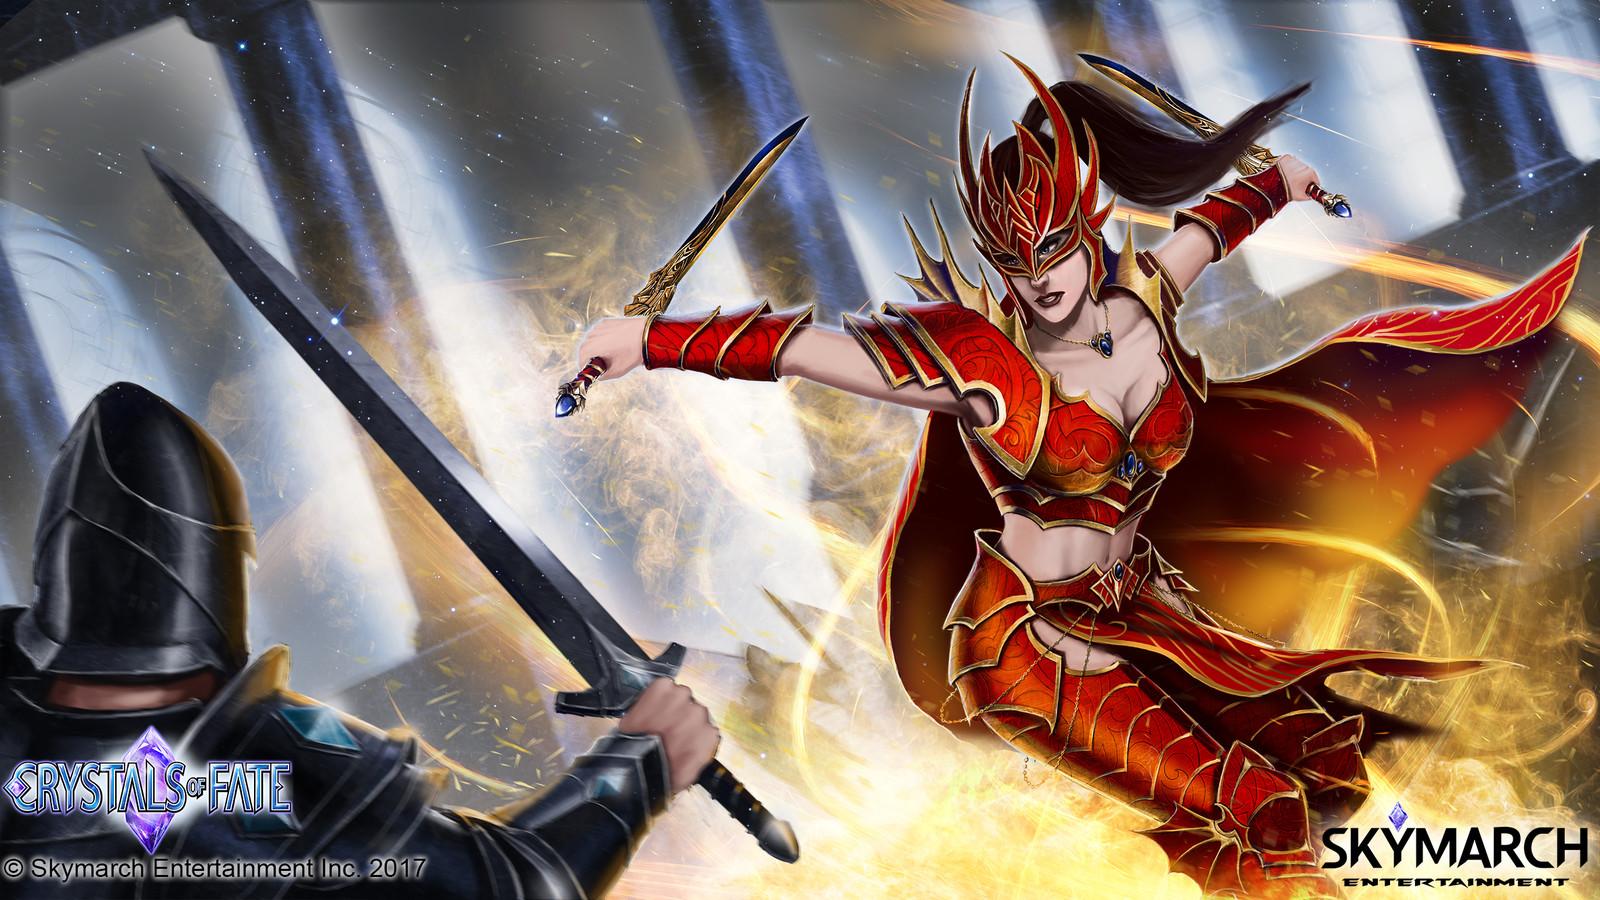 Blood Dragon Saria